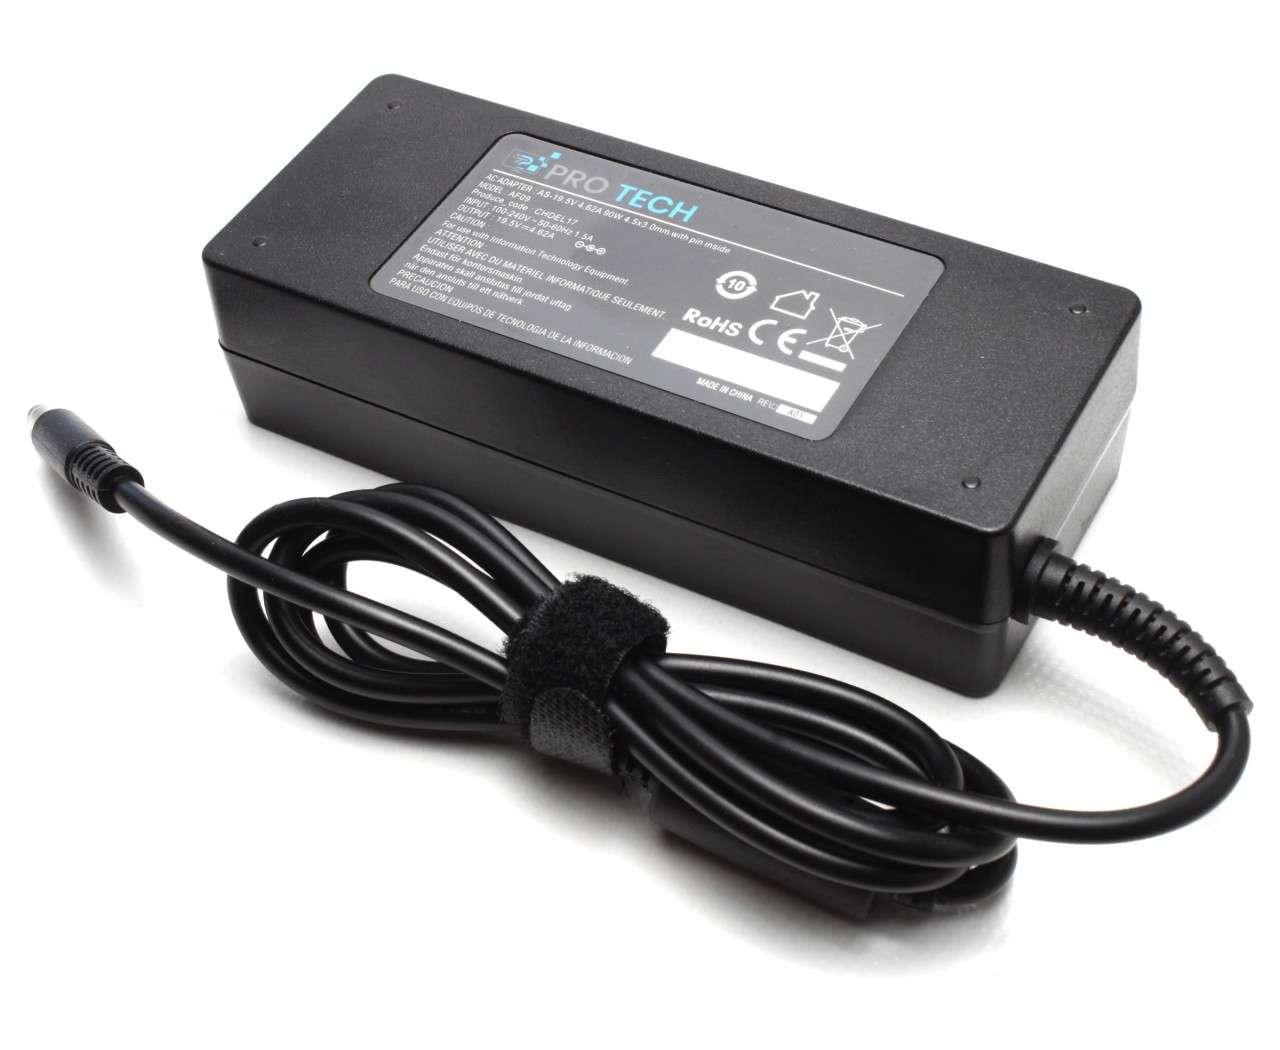 Incarcator Dell Inspiron 14 3452 90W Replacement imagine powerlaptop.ro 2021